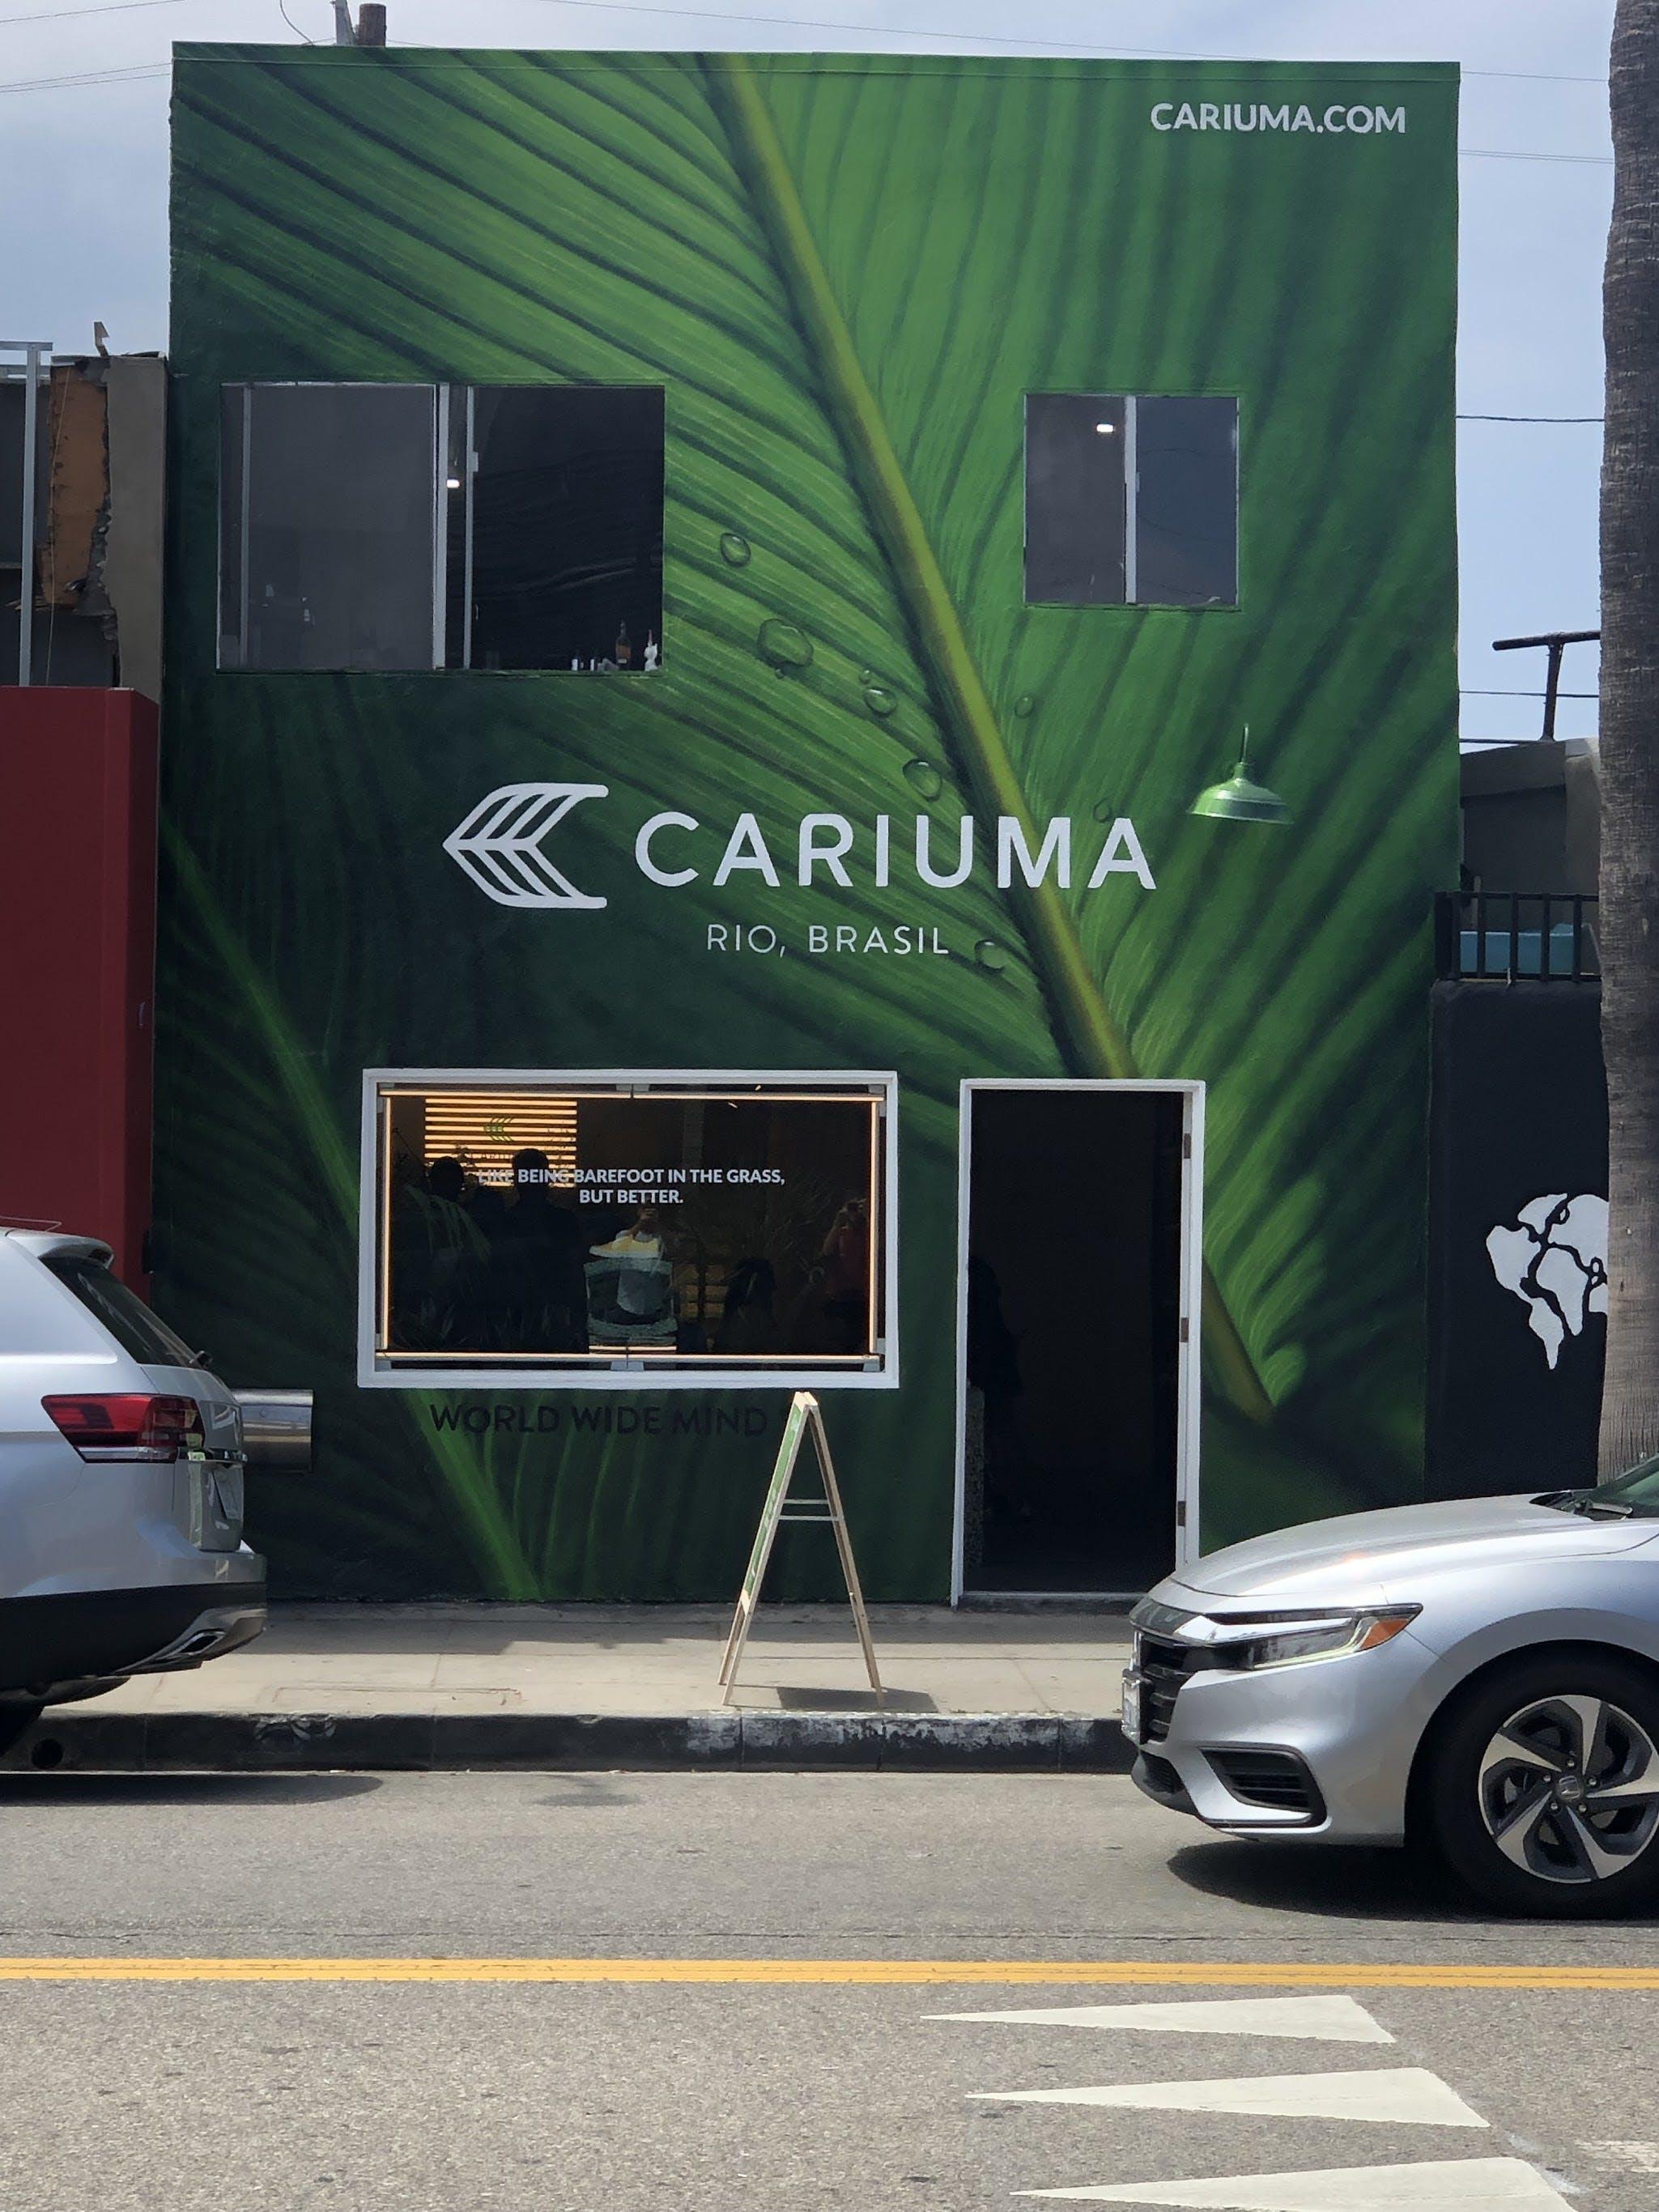 Exterior of a building labeled Caruma